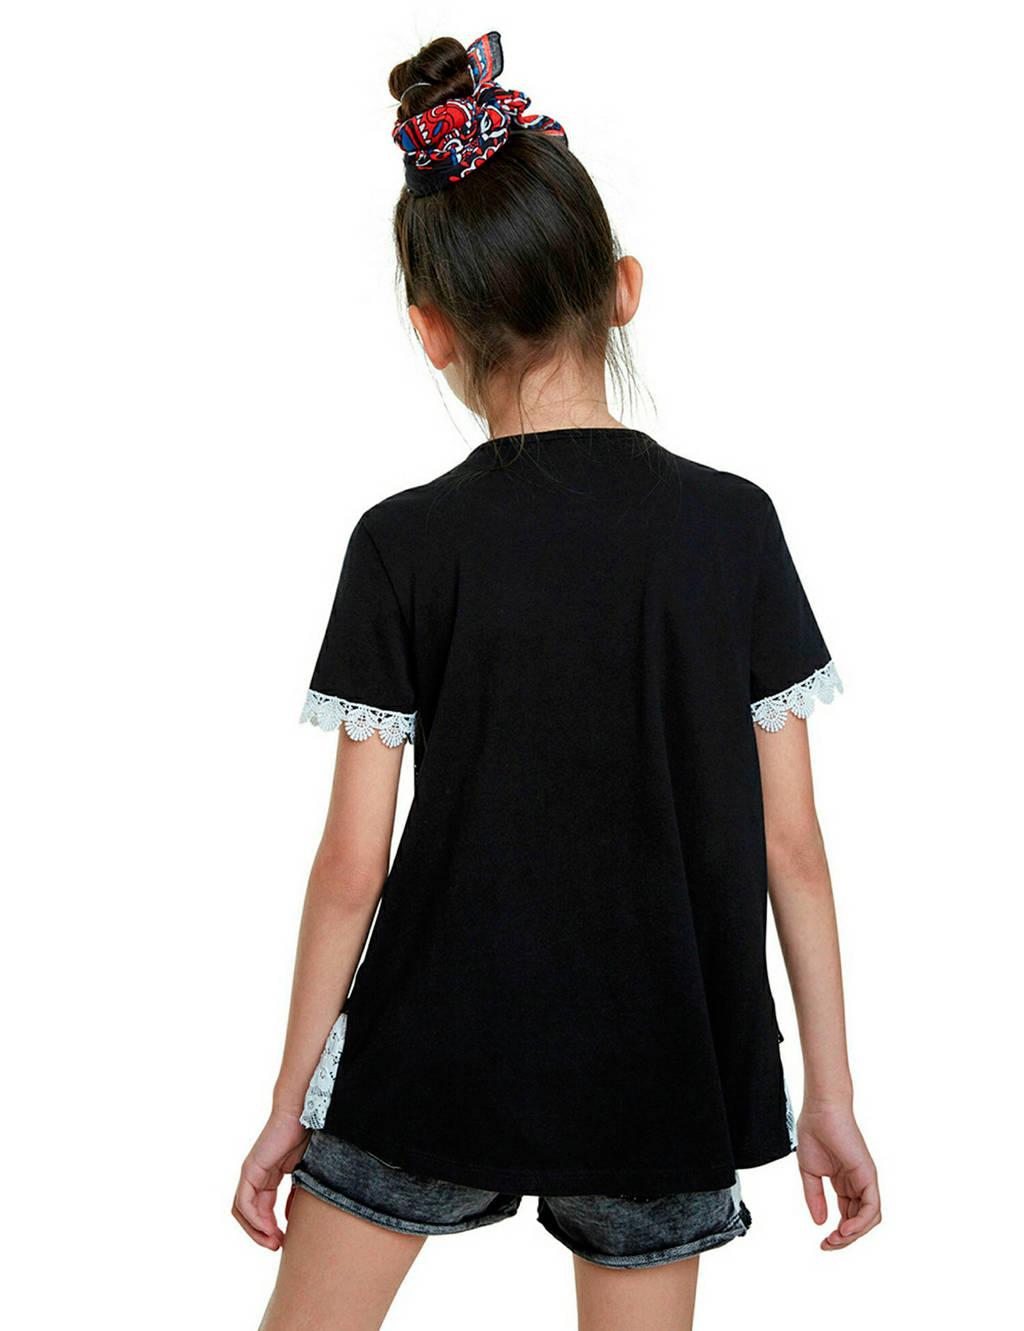 Desigual T-shirt met tekst en kant zwart/wit, Zwart/wit